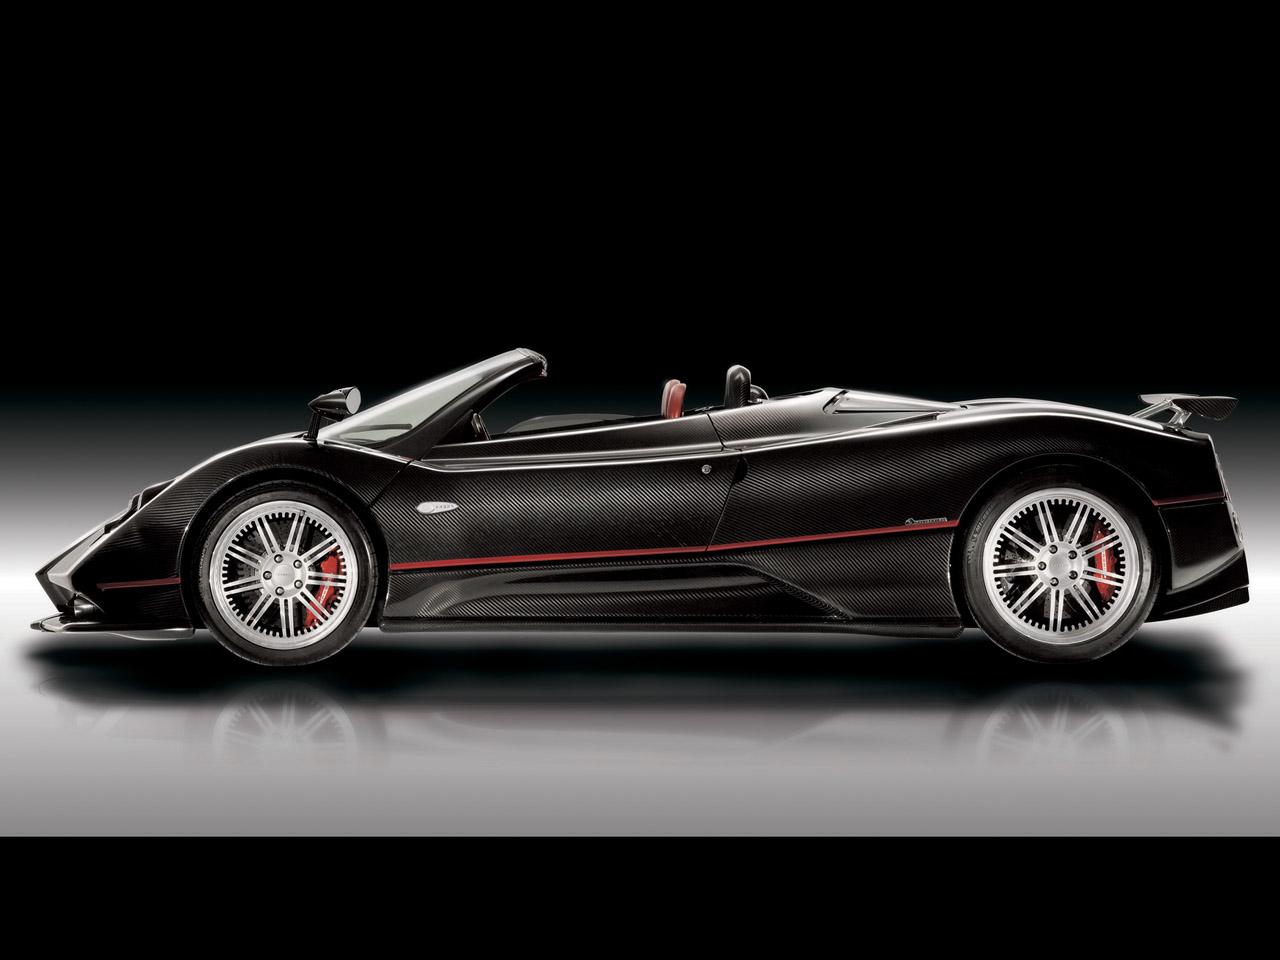 2006 Pagani Zonda Roadster F - Side - 1280x960 Wallpaper